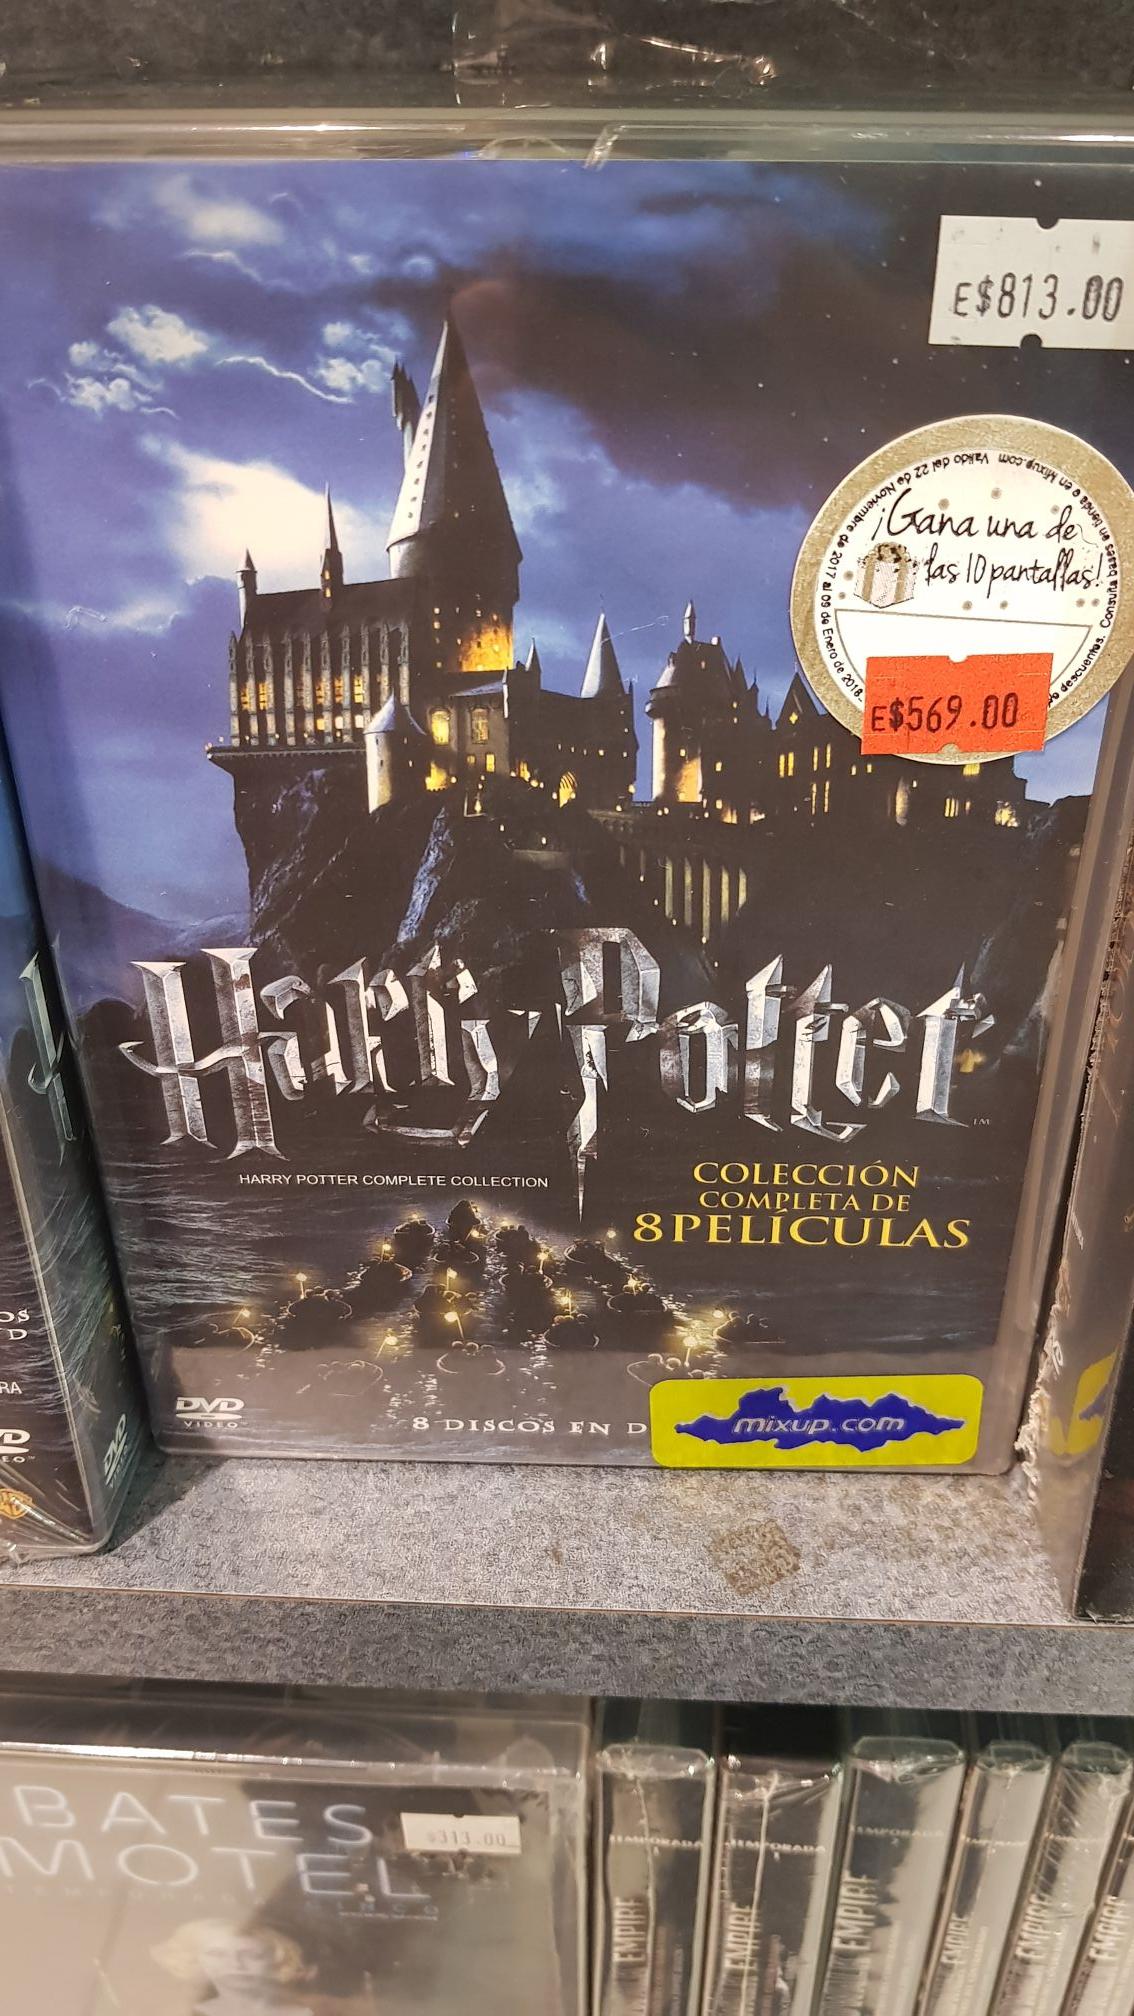 Mixup: Colección Harry Potter DVD las 8 películas.